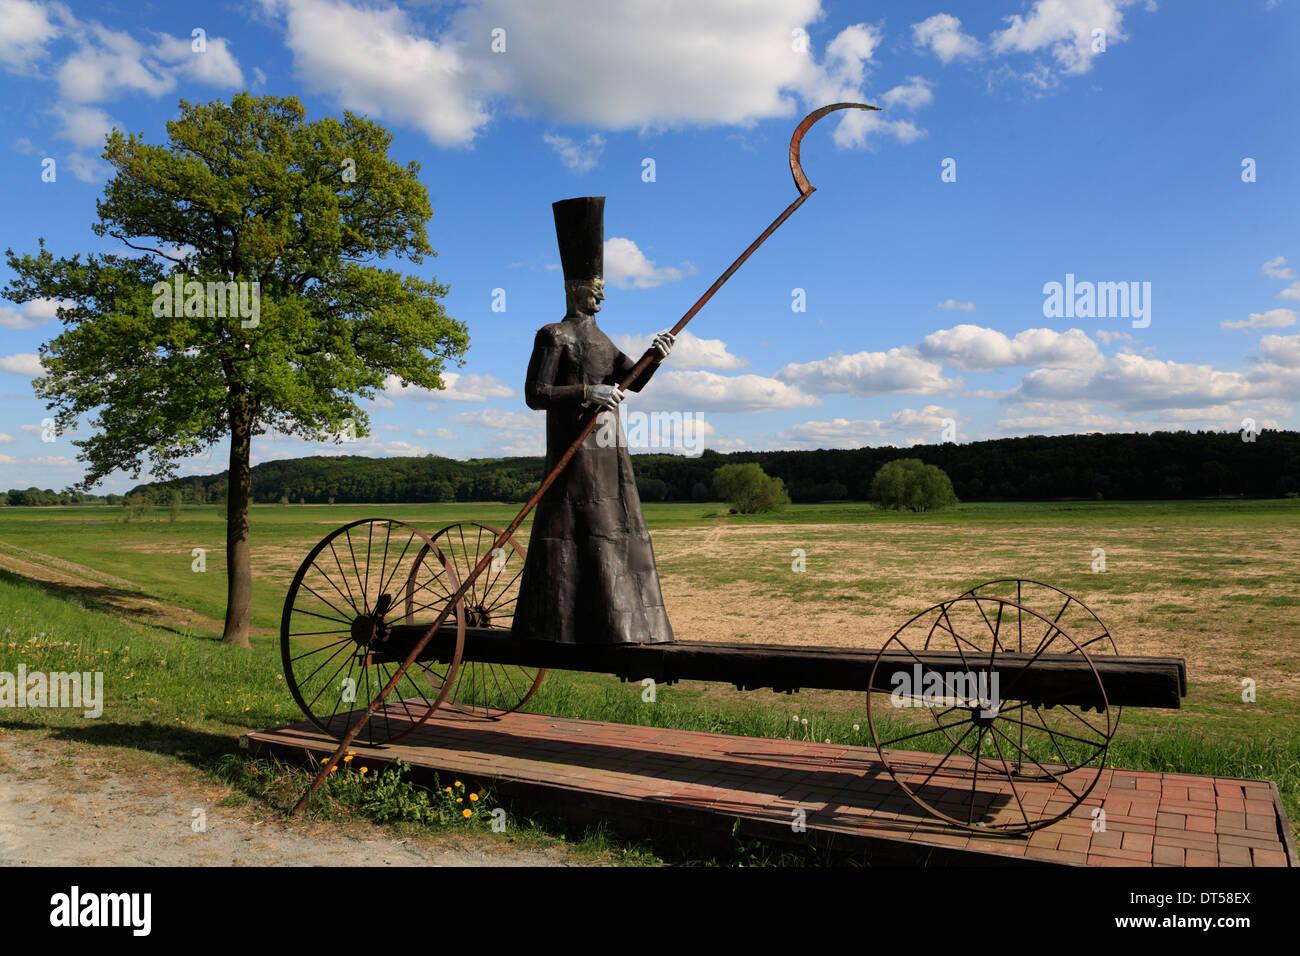 Art objekt CHARON by Bernd Streiter, Moedlich, Elbe cycle route, Brandenburg, Germany, Europe - Stock Image